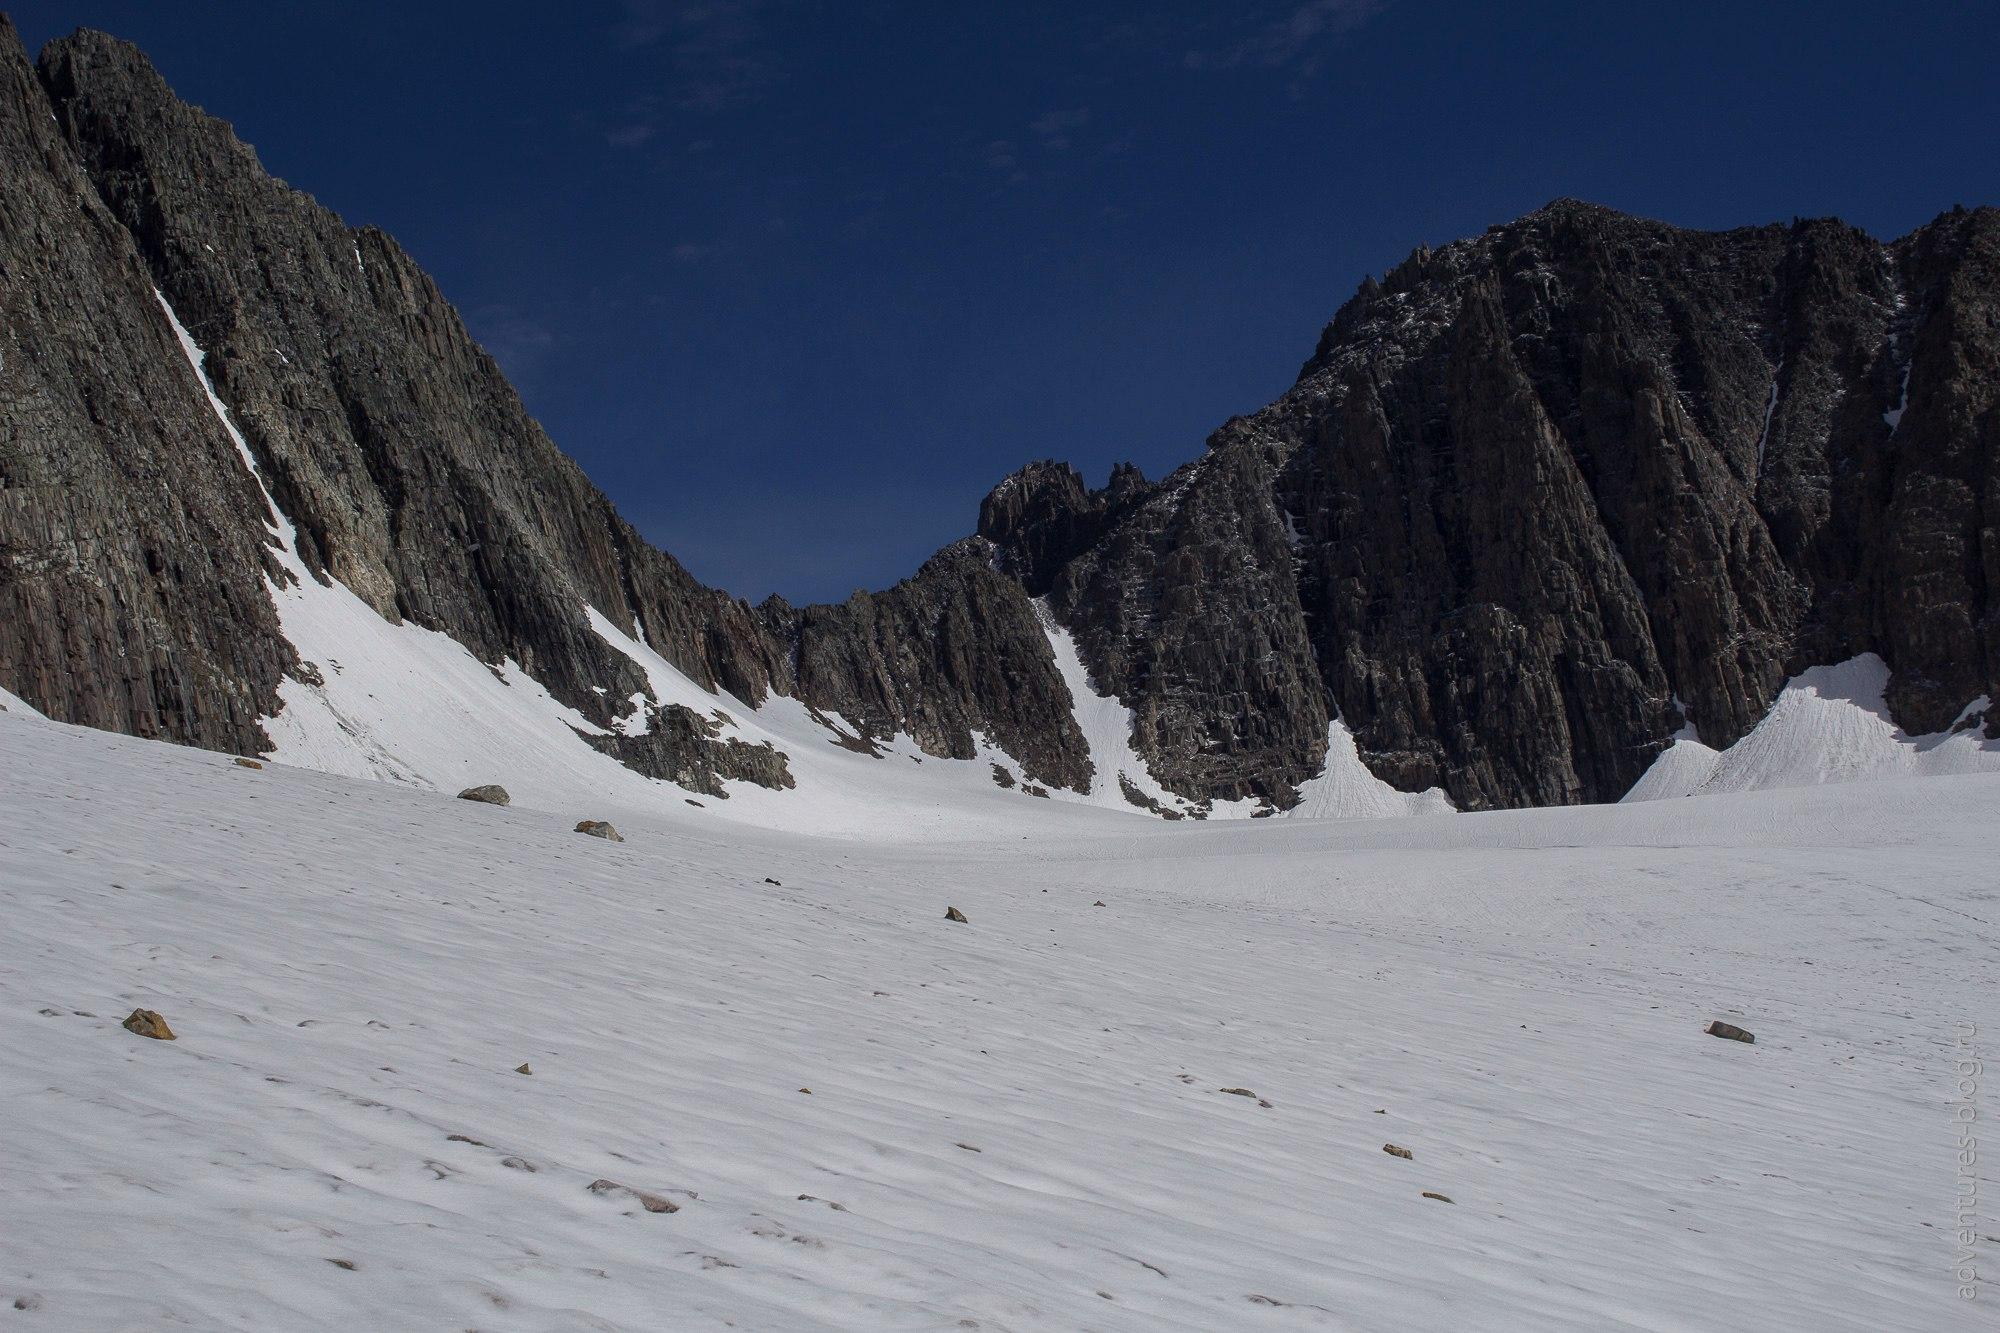 Снежный кулуар справа - перевал Абыл-оюк